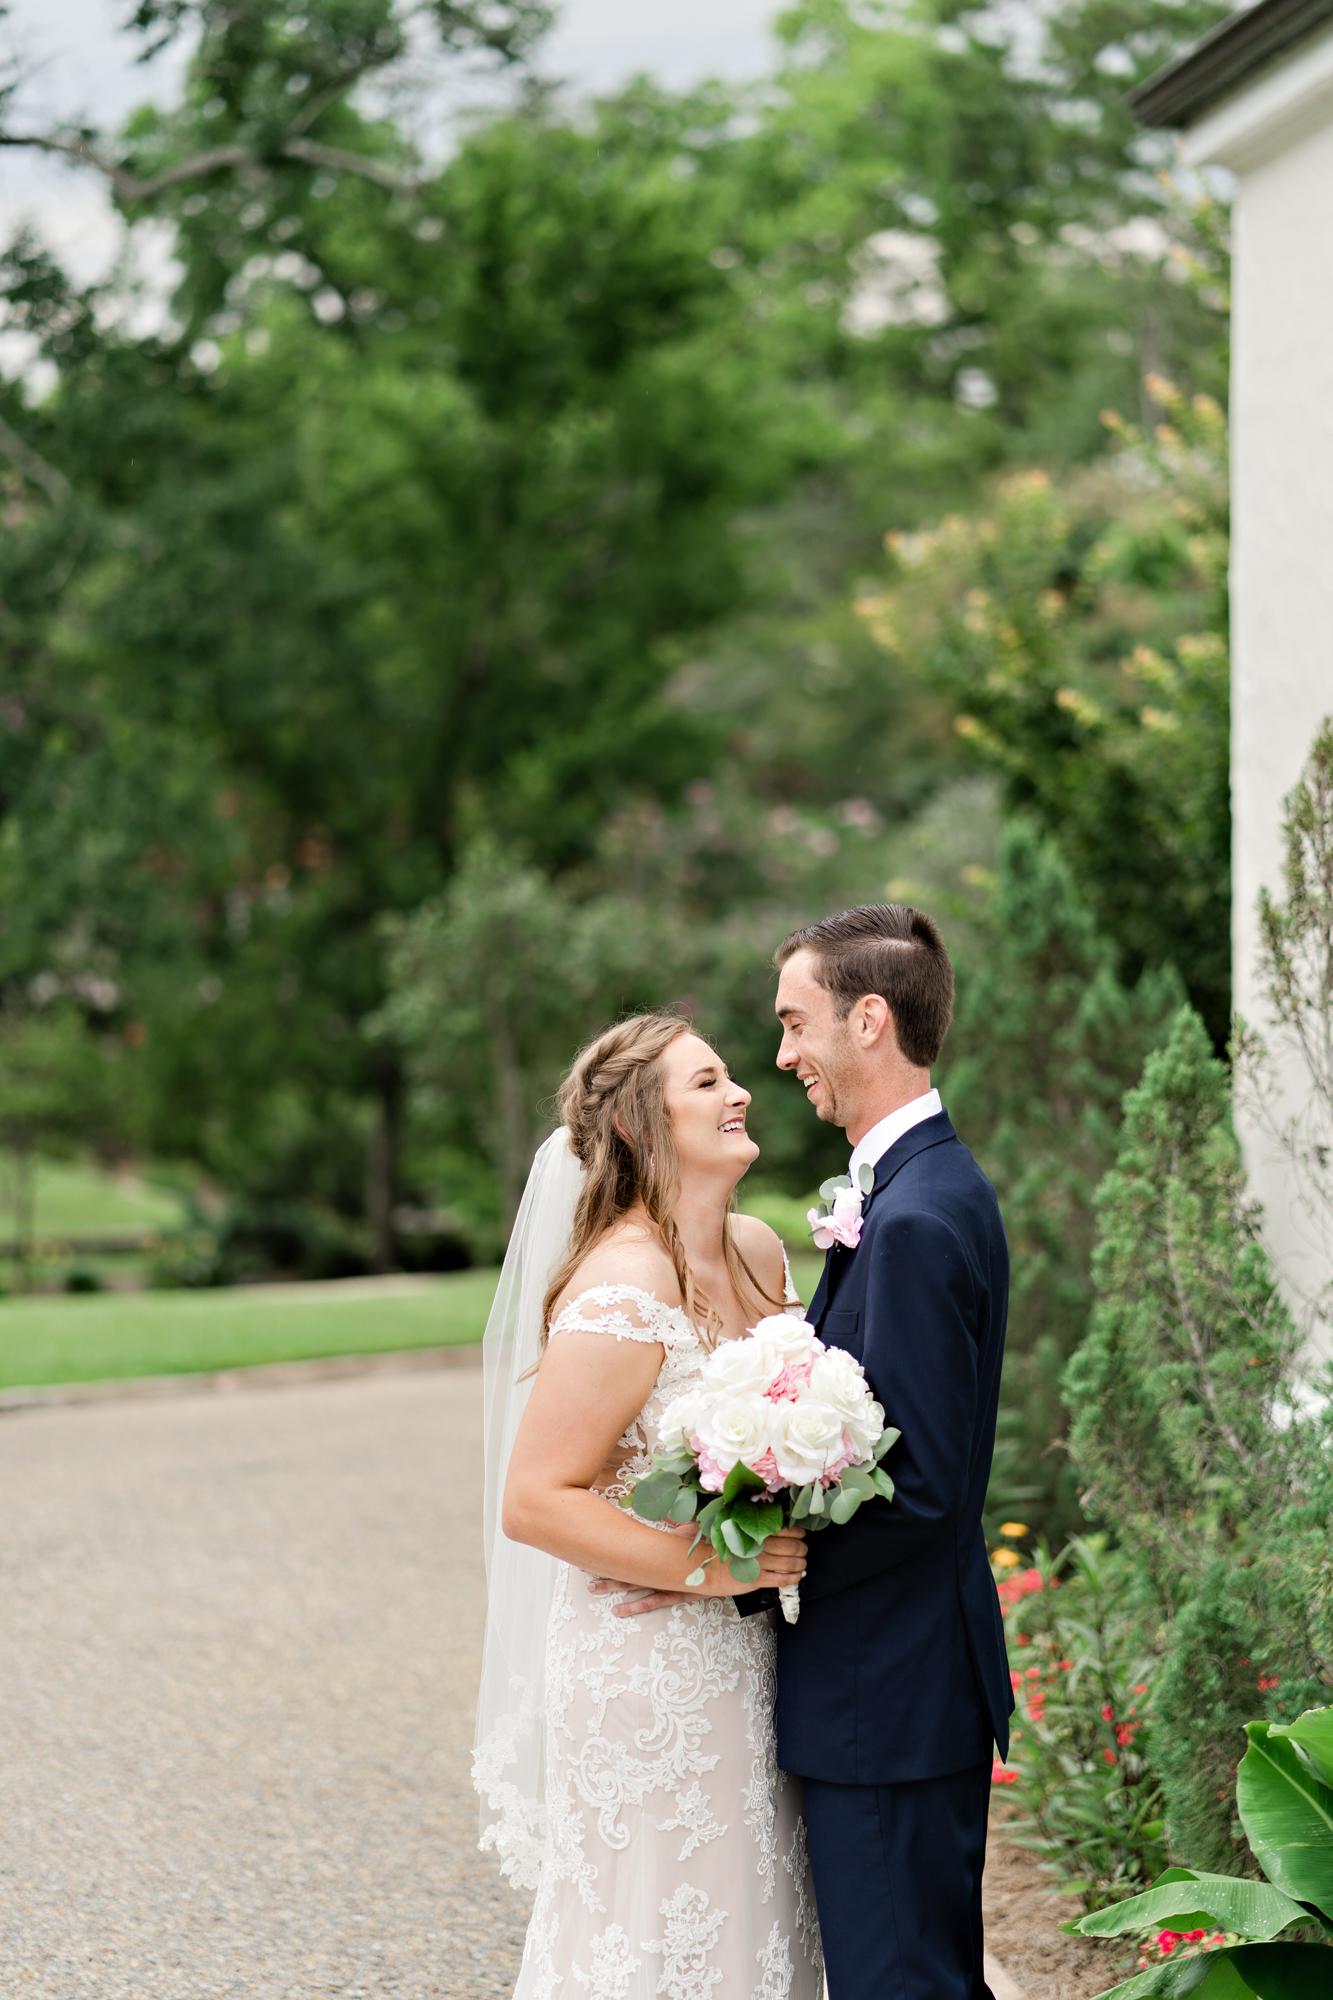 Alabama-Wedding-Photographer-Nick-Drollette-116.jpg